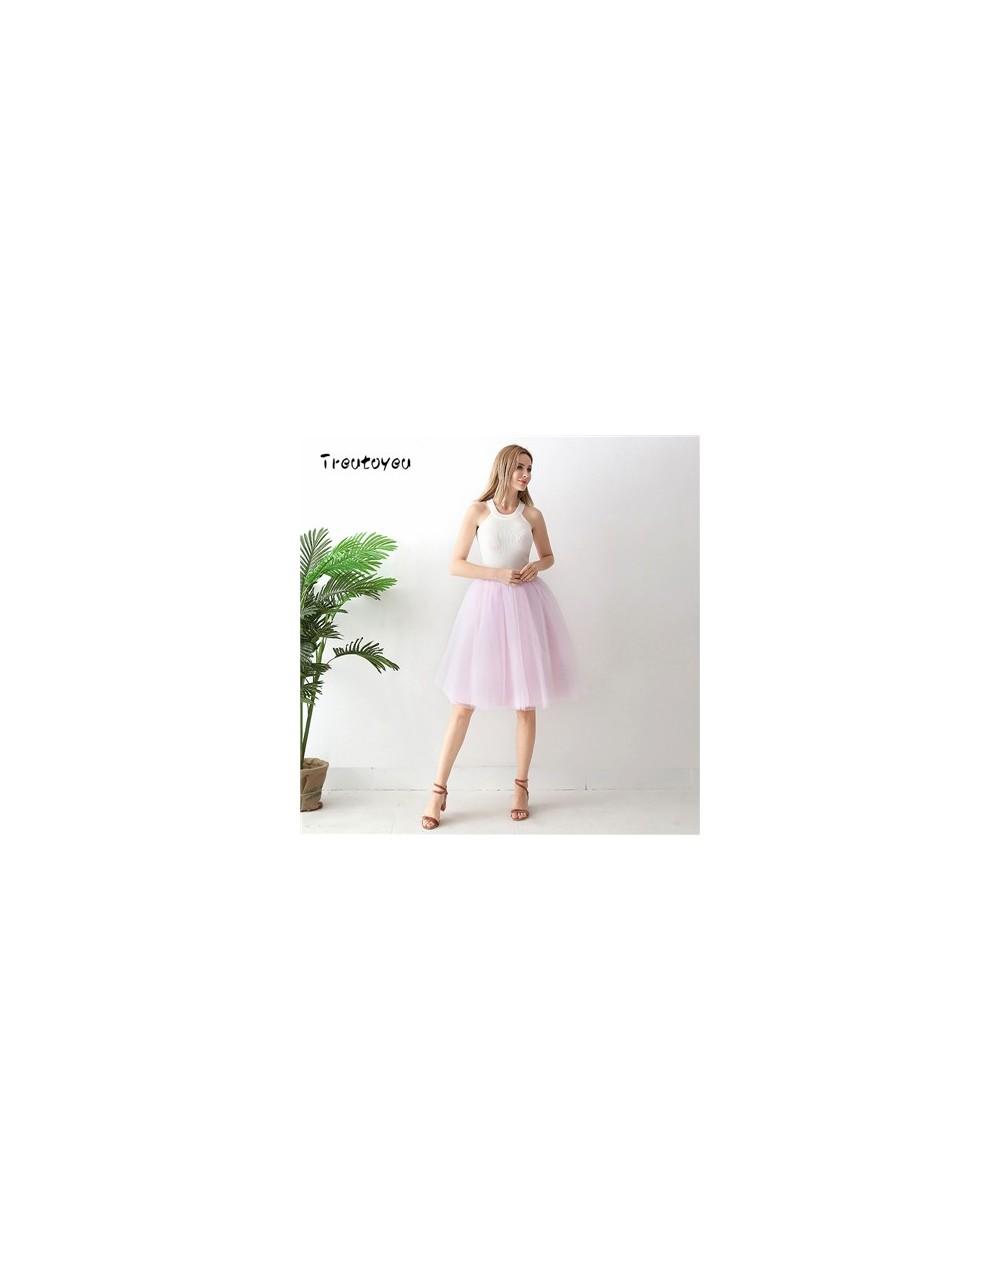 5 Layers 65cm Black Pleated skirt Sexy Midi Tulle skirt High Waist Full Lining Adult Tutu Korean Style Women - Baby Pink - 4...